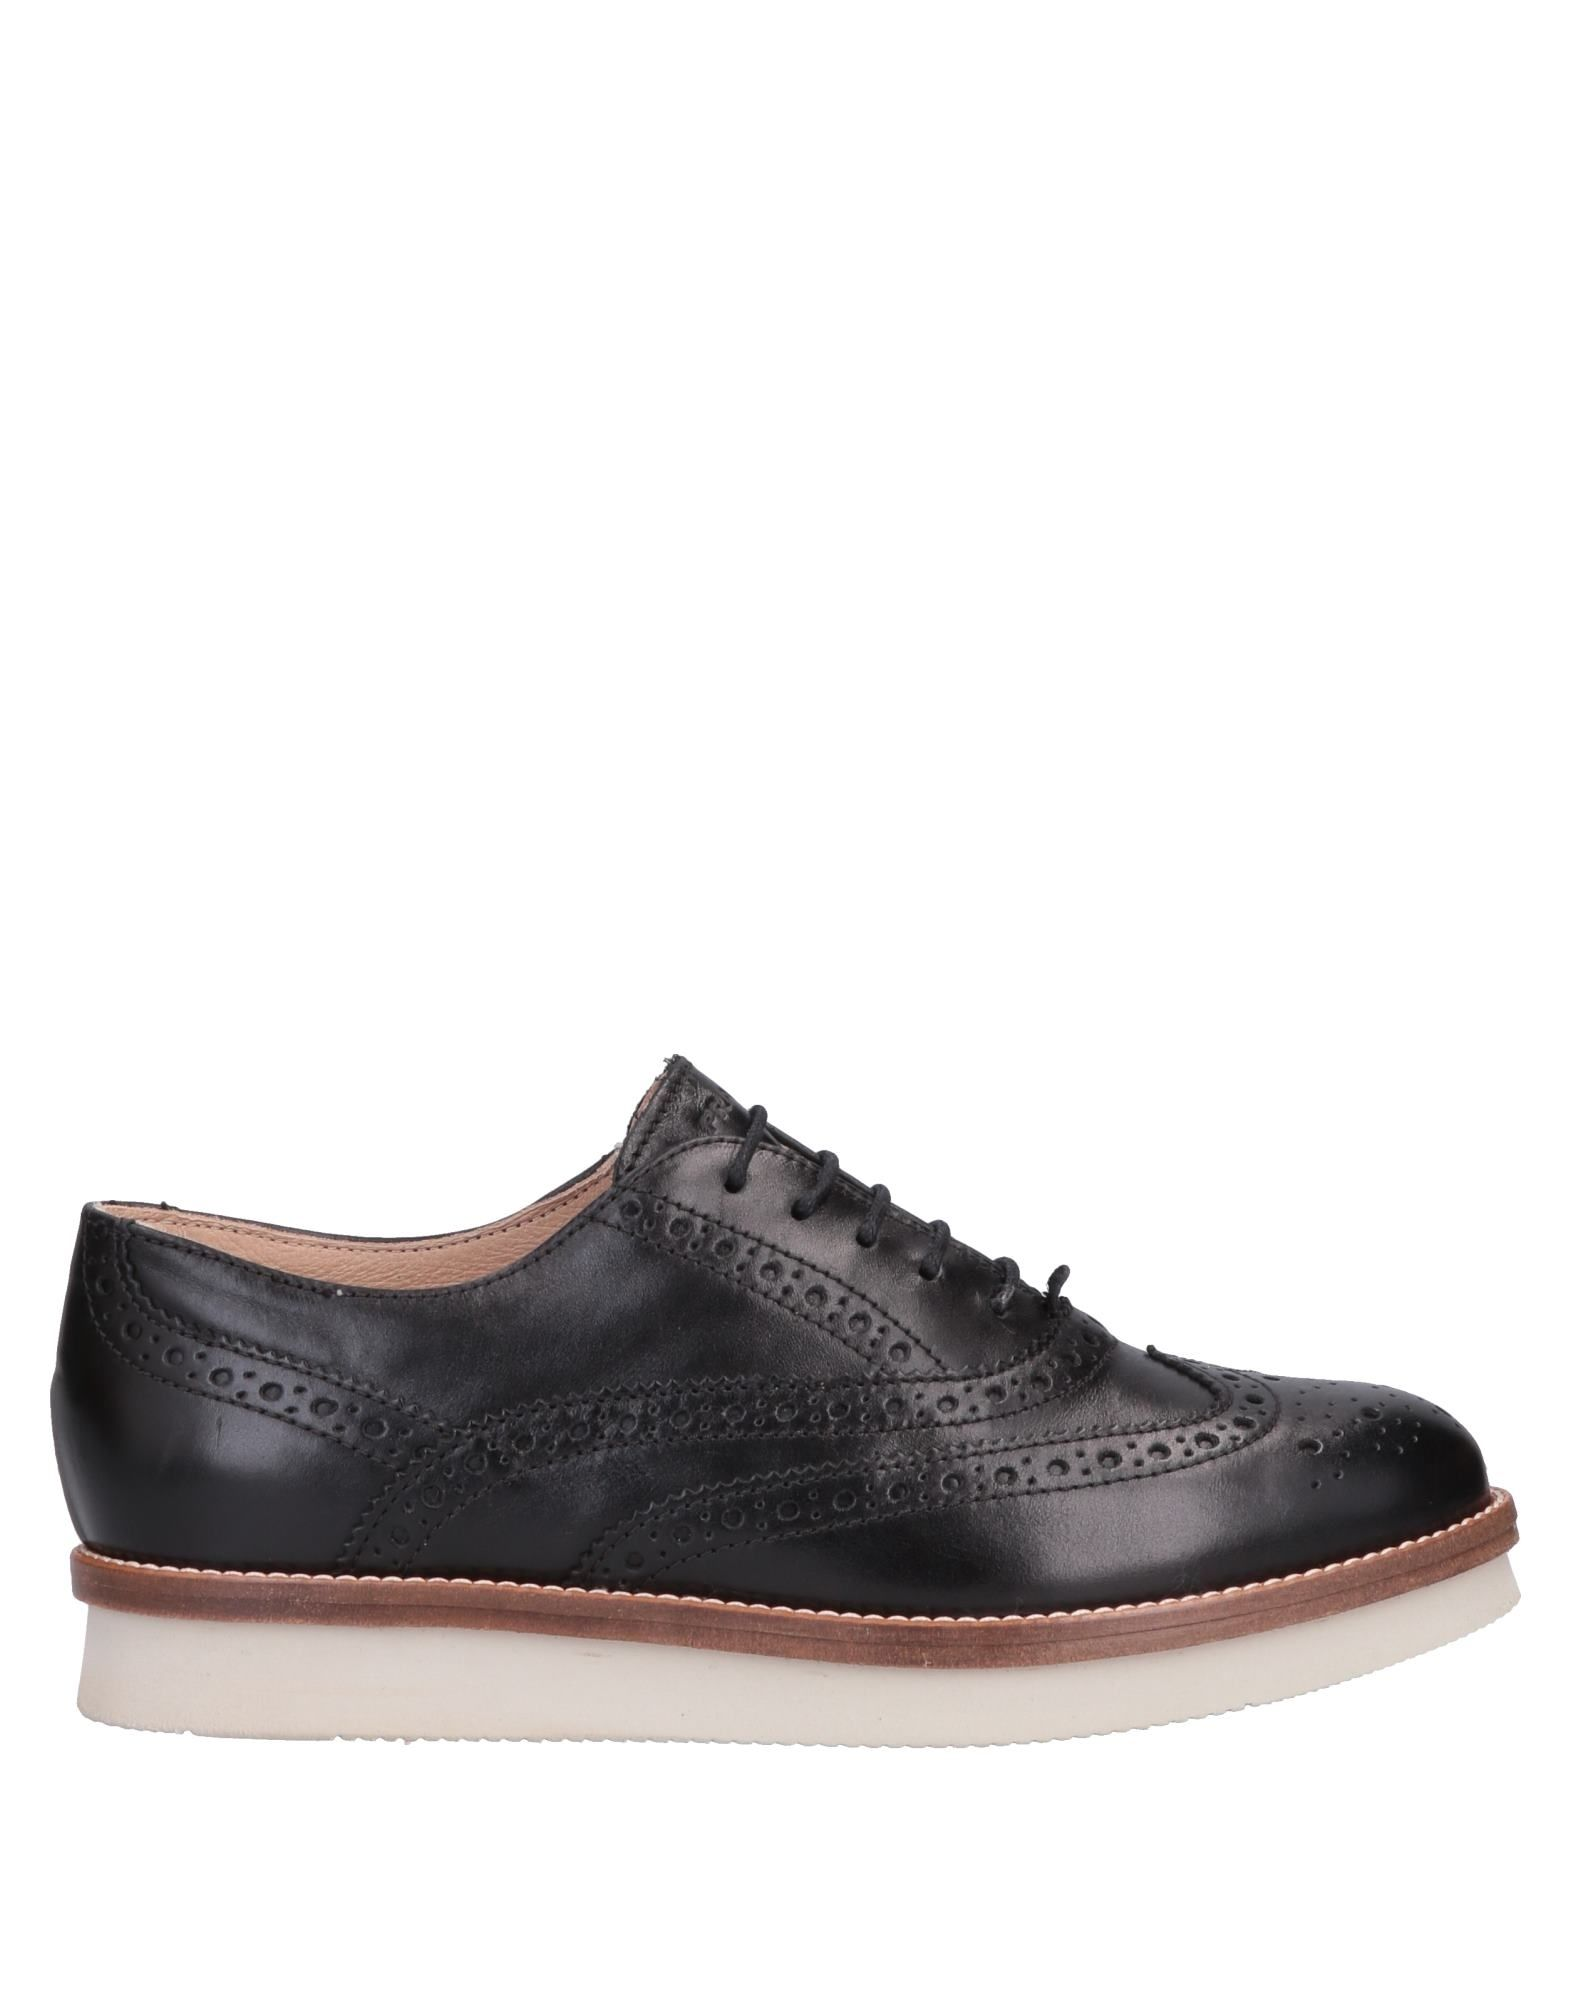 Фото - FRAU Обувь на шнурках обувь на высокой платформе dkny